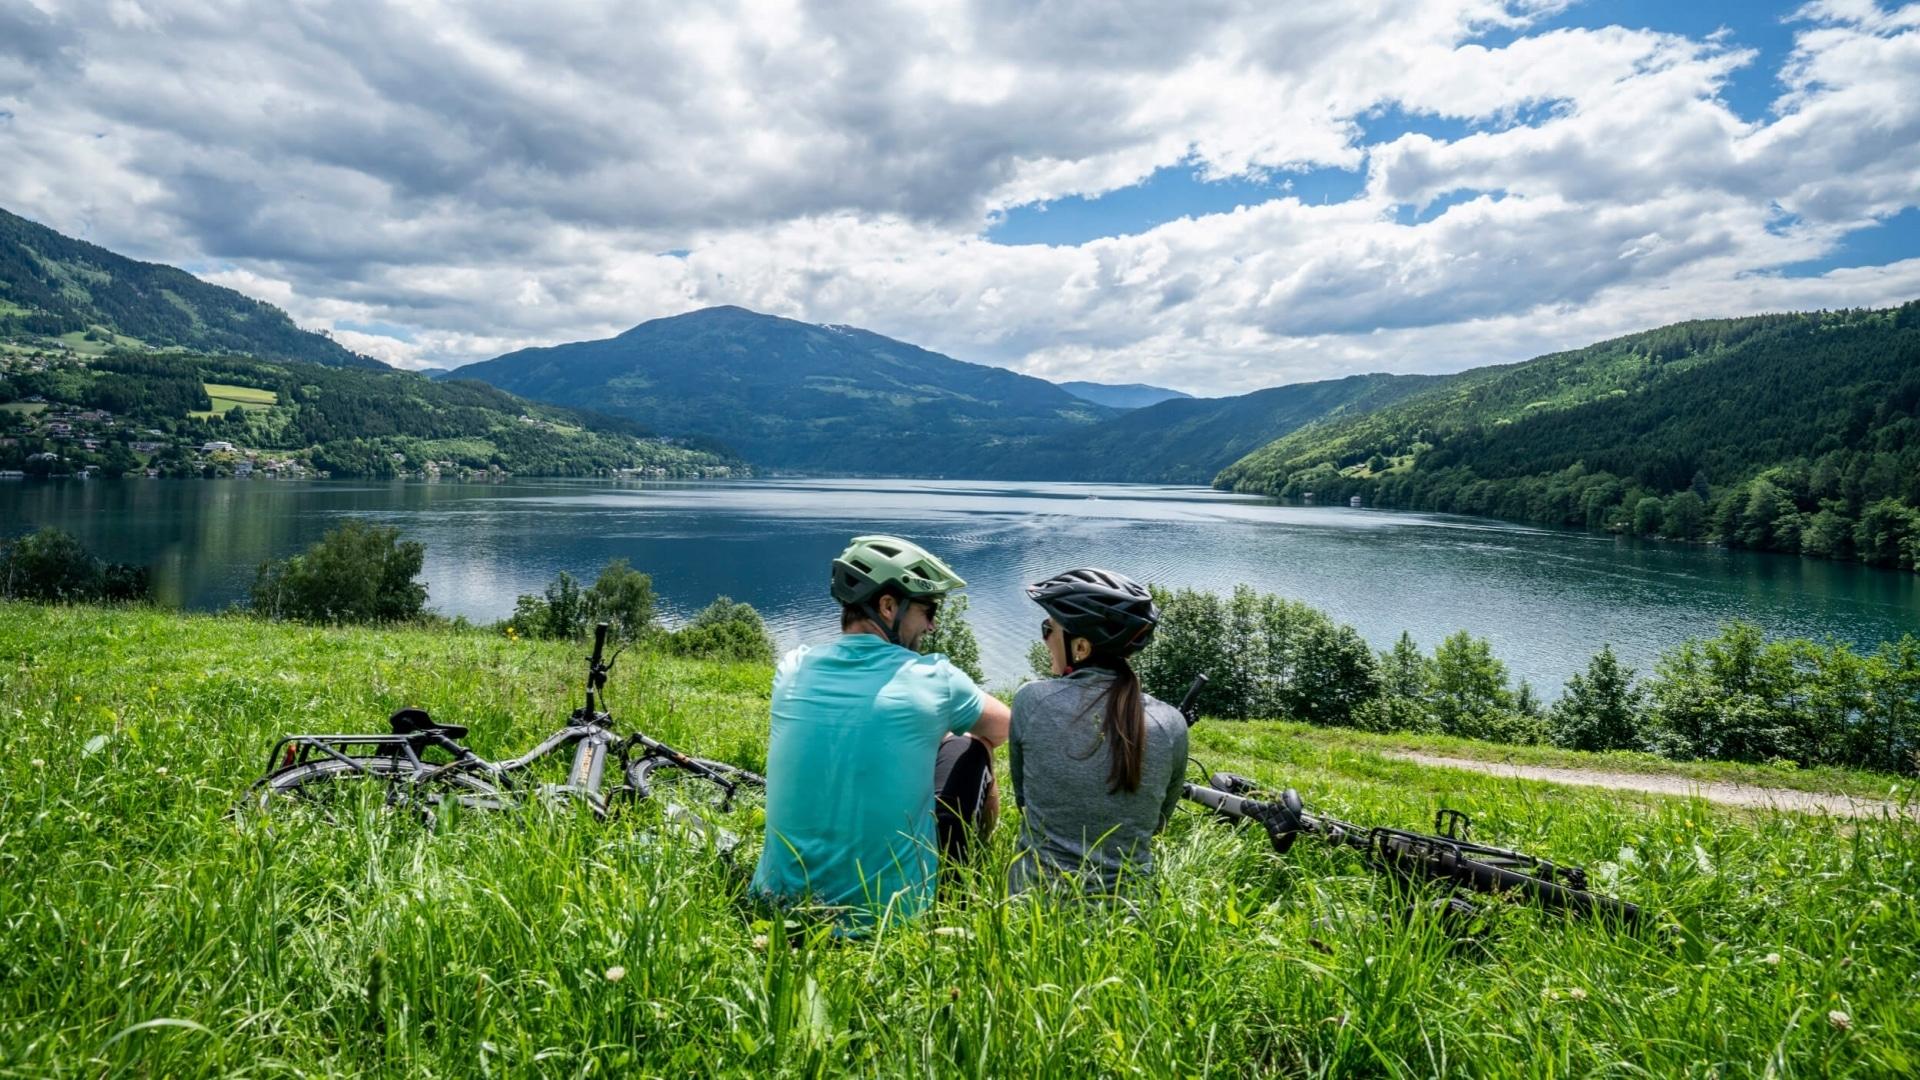 Pause der Radfahrer am Millstätter See © Gert Perauer